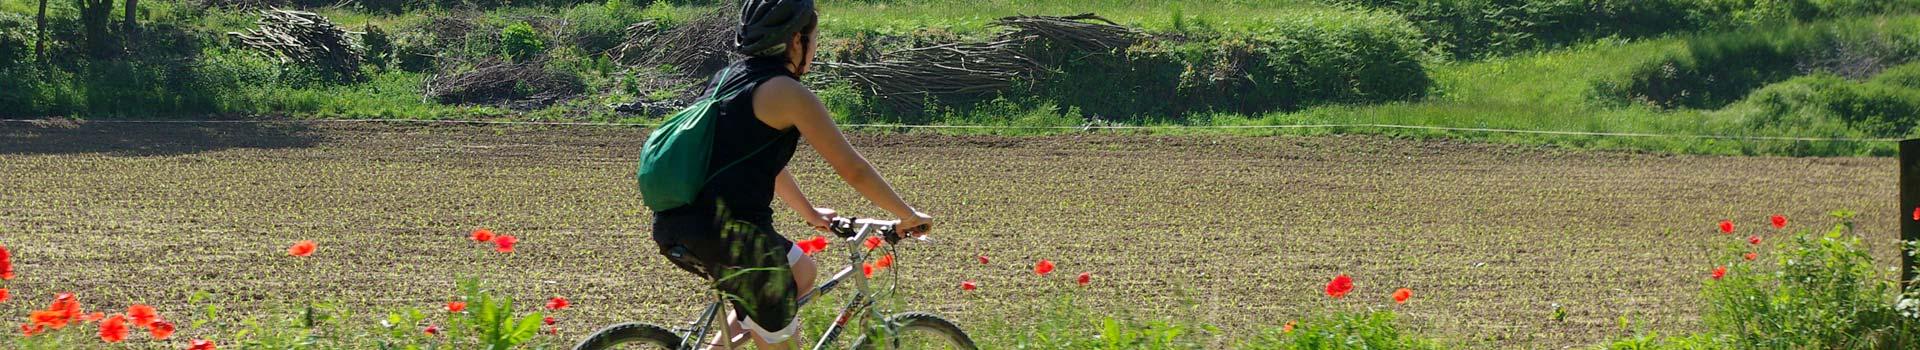 rutes-bicicleta-garrotxa